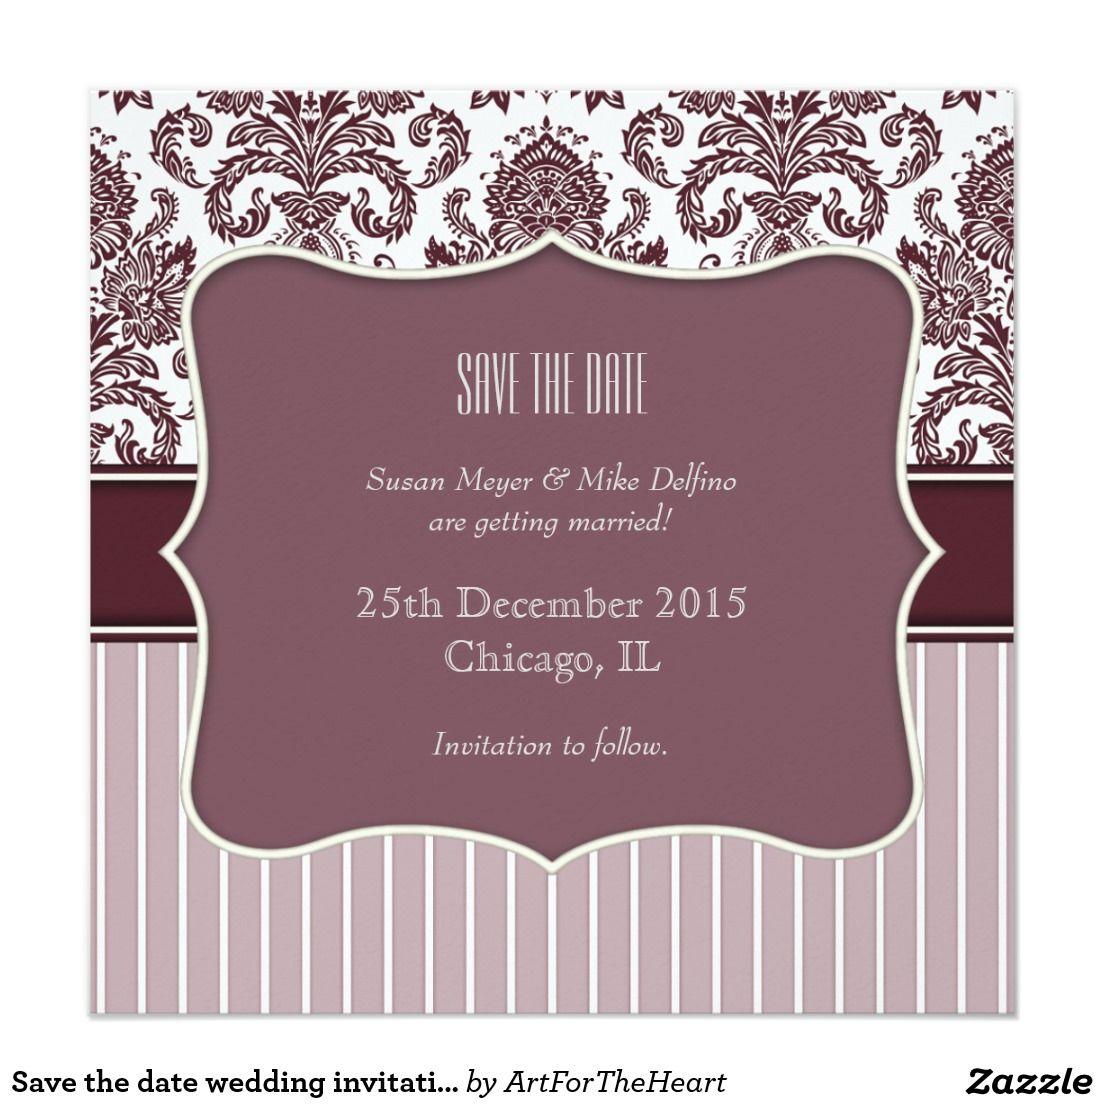 Save the date wedding invitation card purple | Wedding invitation ...